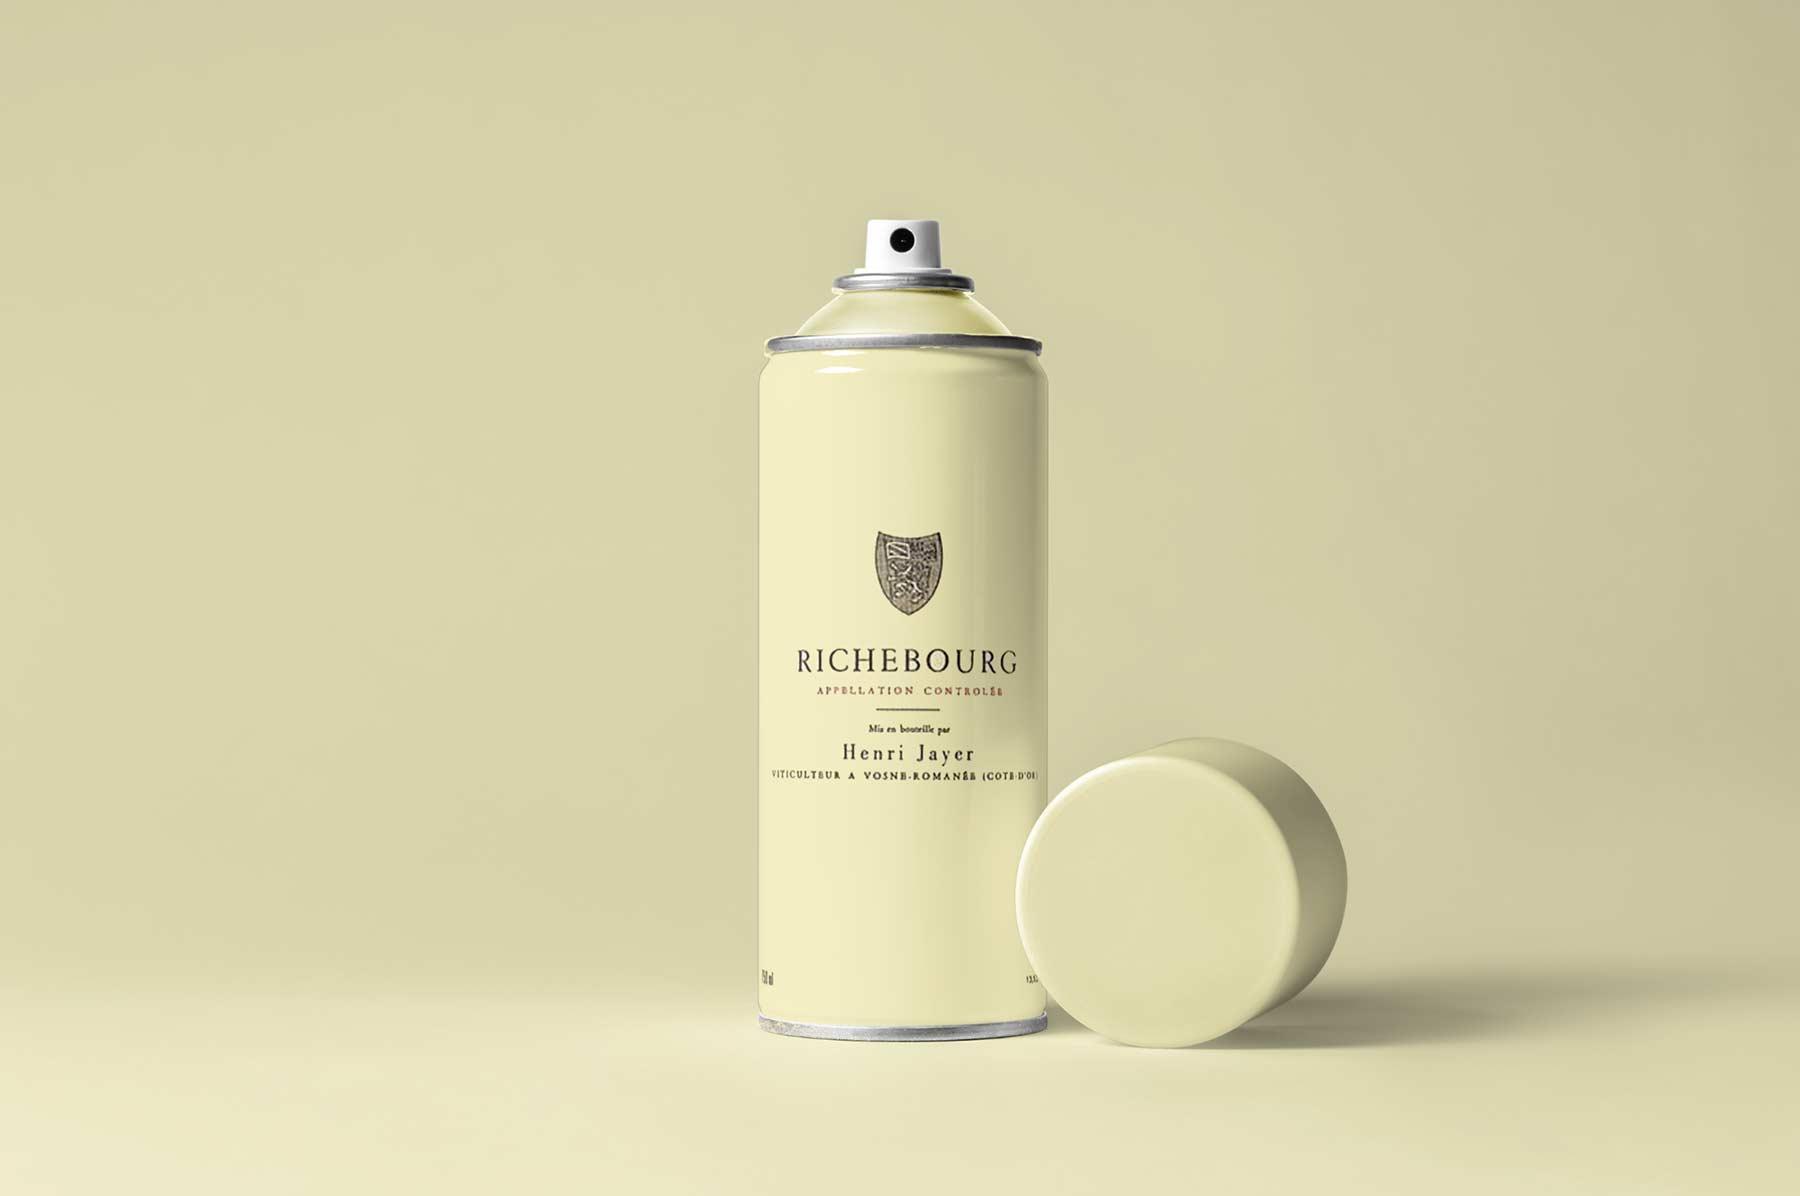 Luxus-Spraydosen Nouveau-Riche-luxus-farbdosen_04